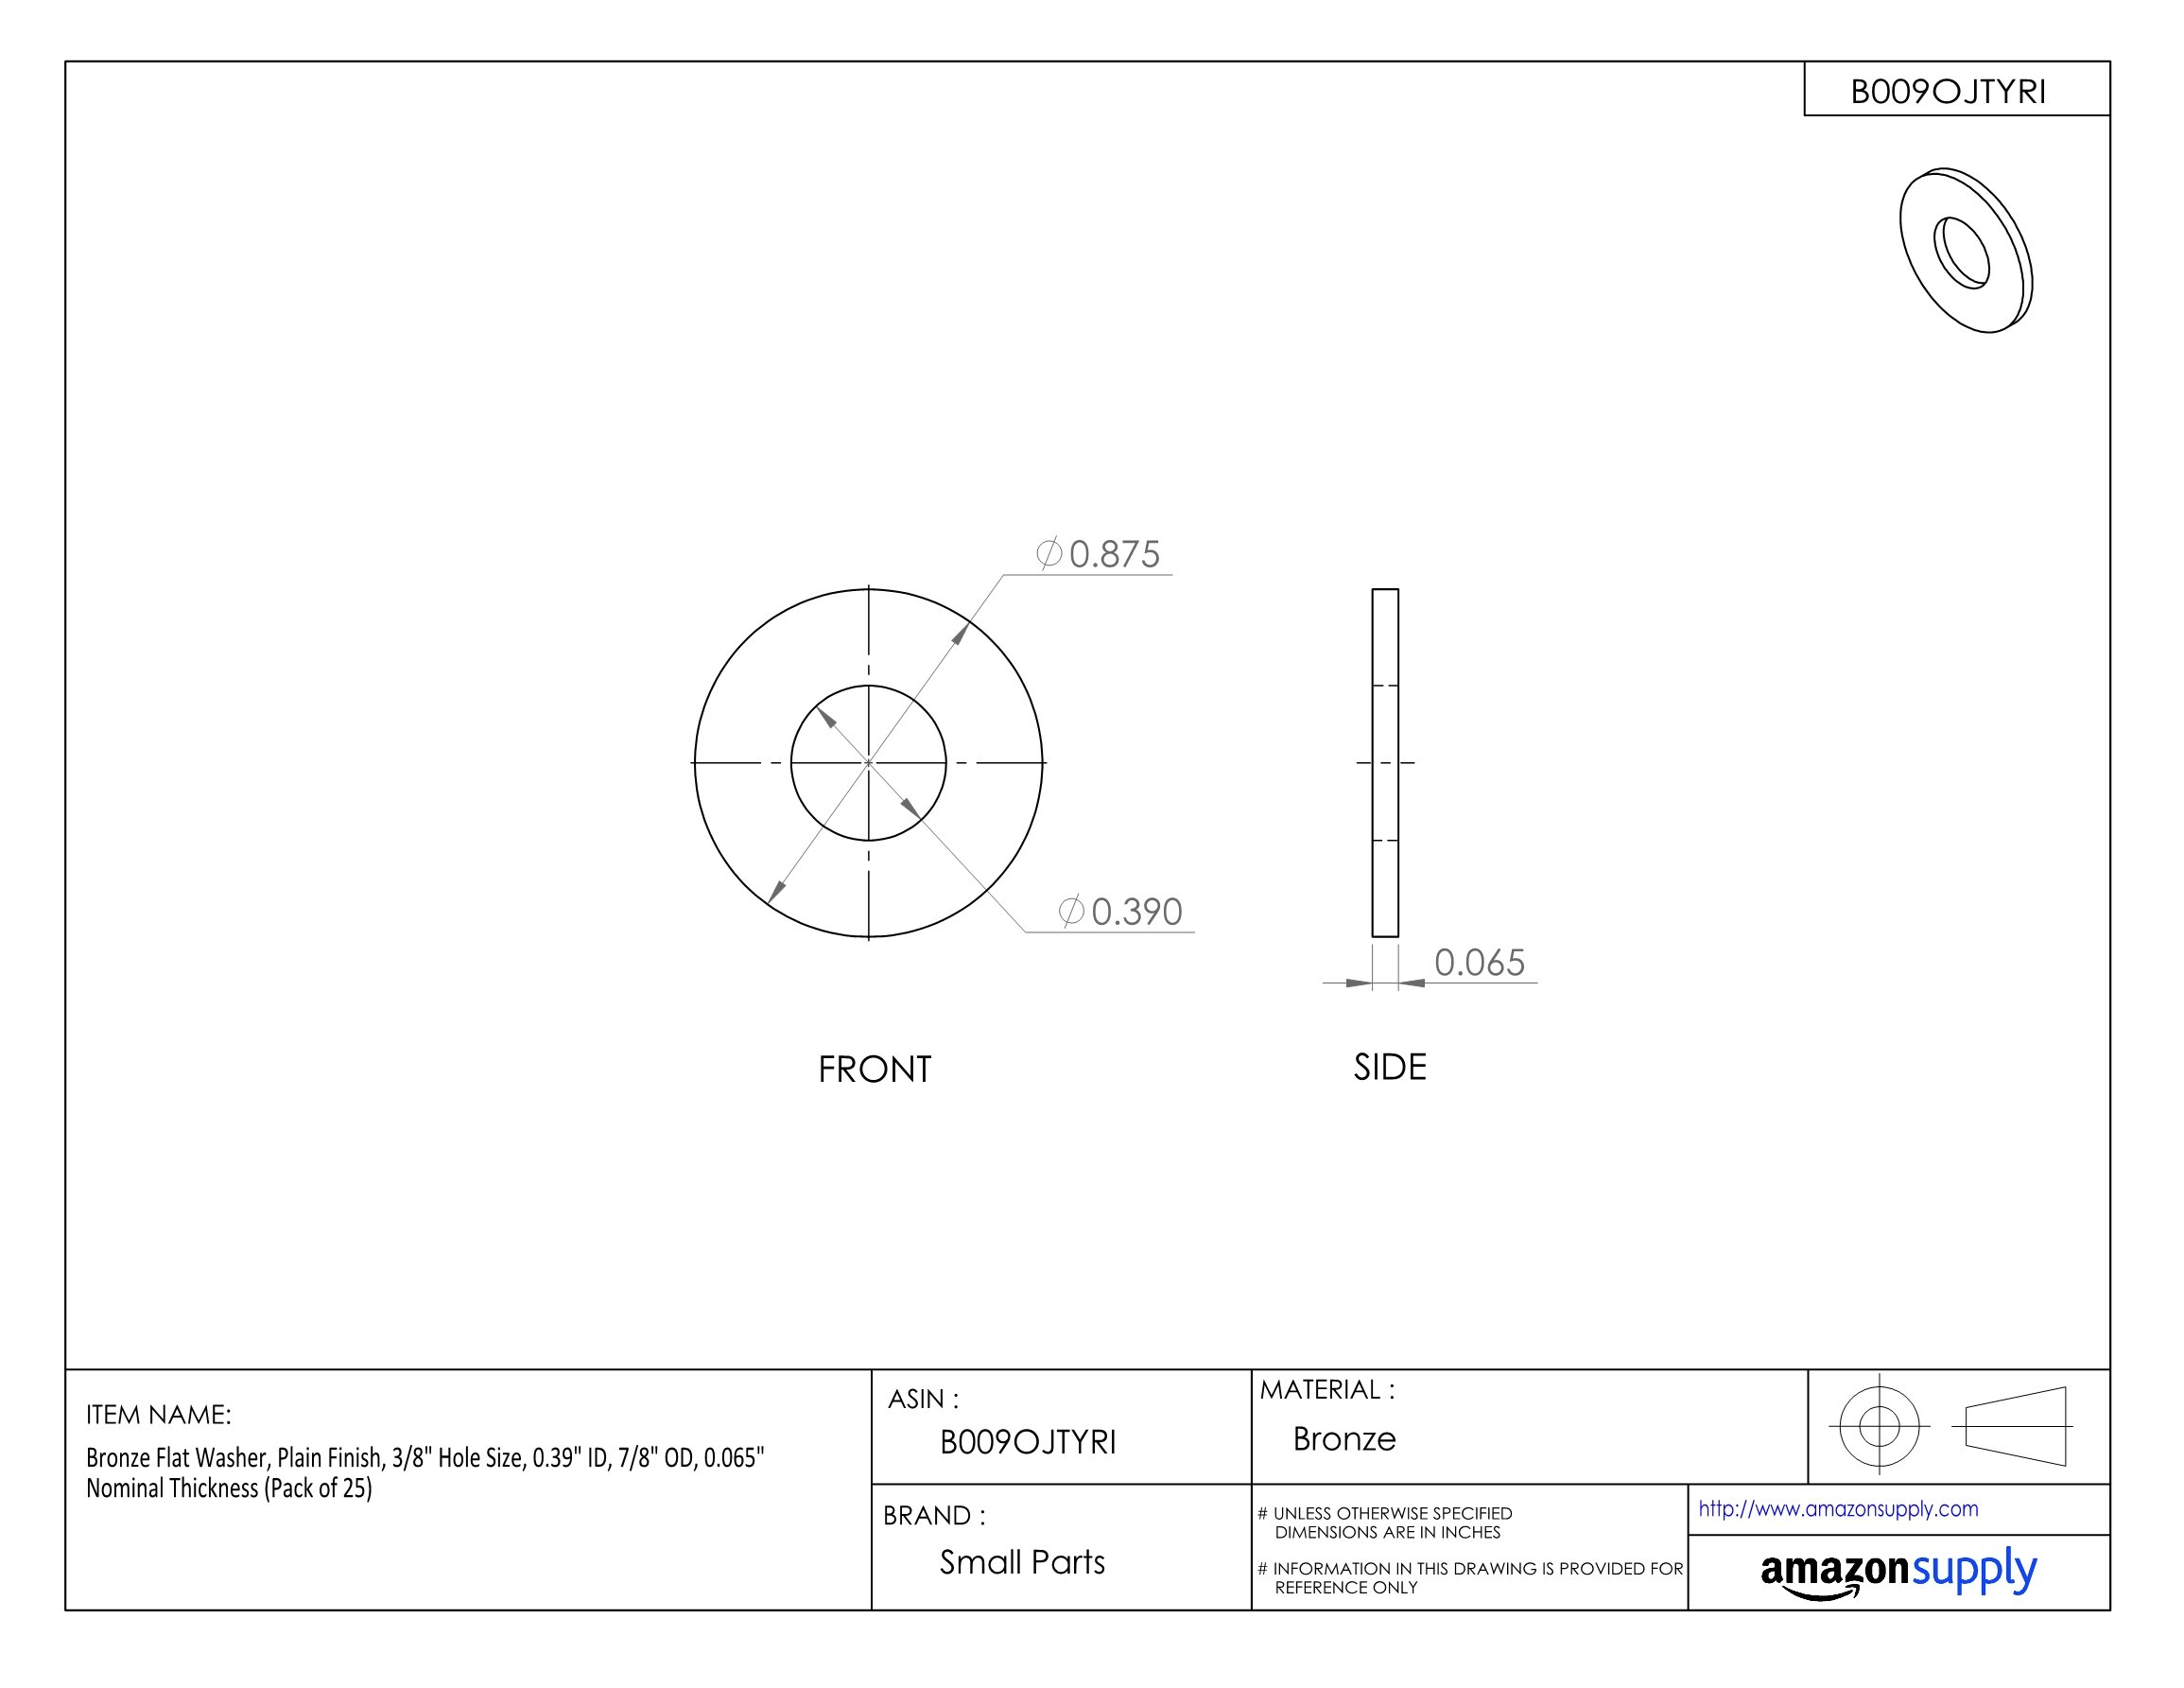 Bronze Flat Washer, Plain Finish, 3/8 Hole Size, 0.39'' ID, 7/8 OD, 0.065'' Nominal Thickness (Pack of 25)